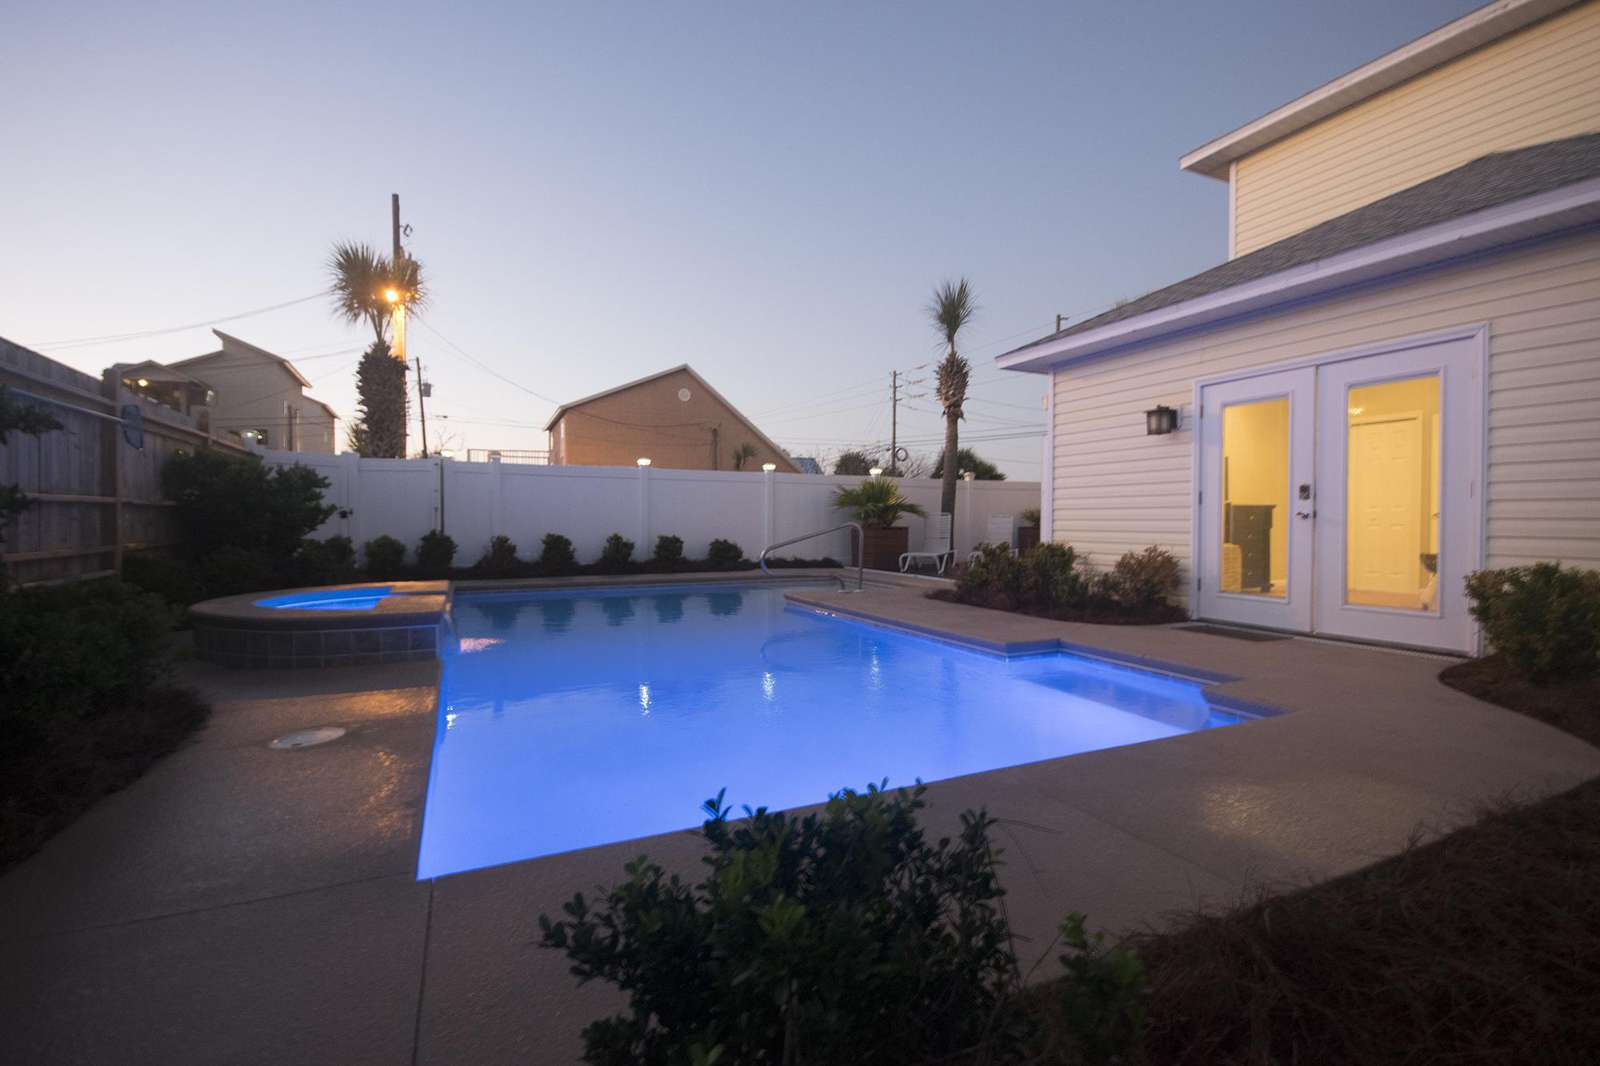 Inquire for seasonal pool heat rates!